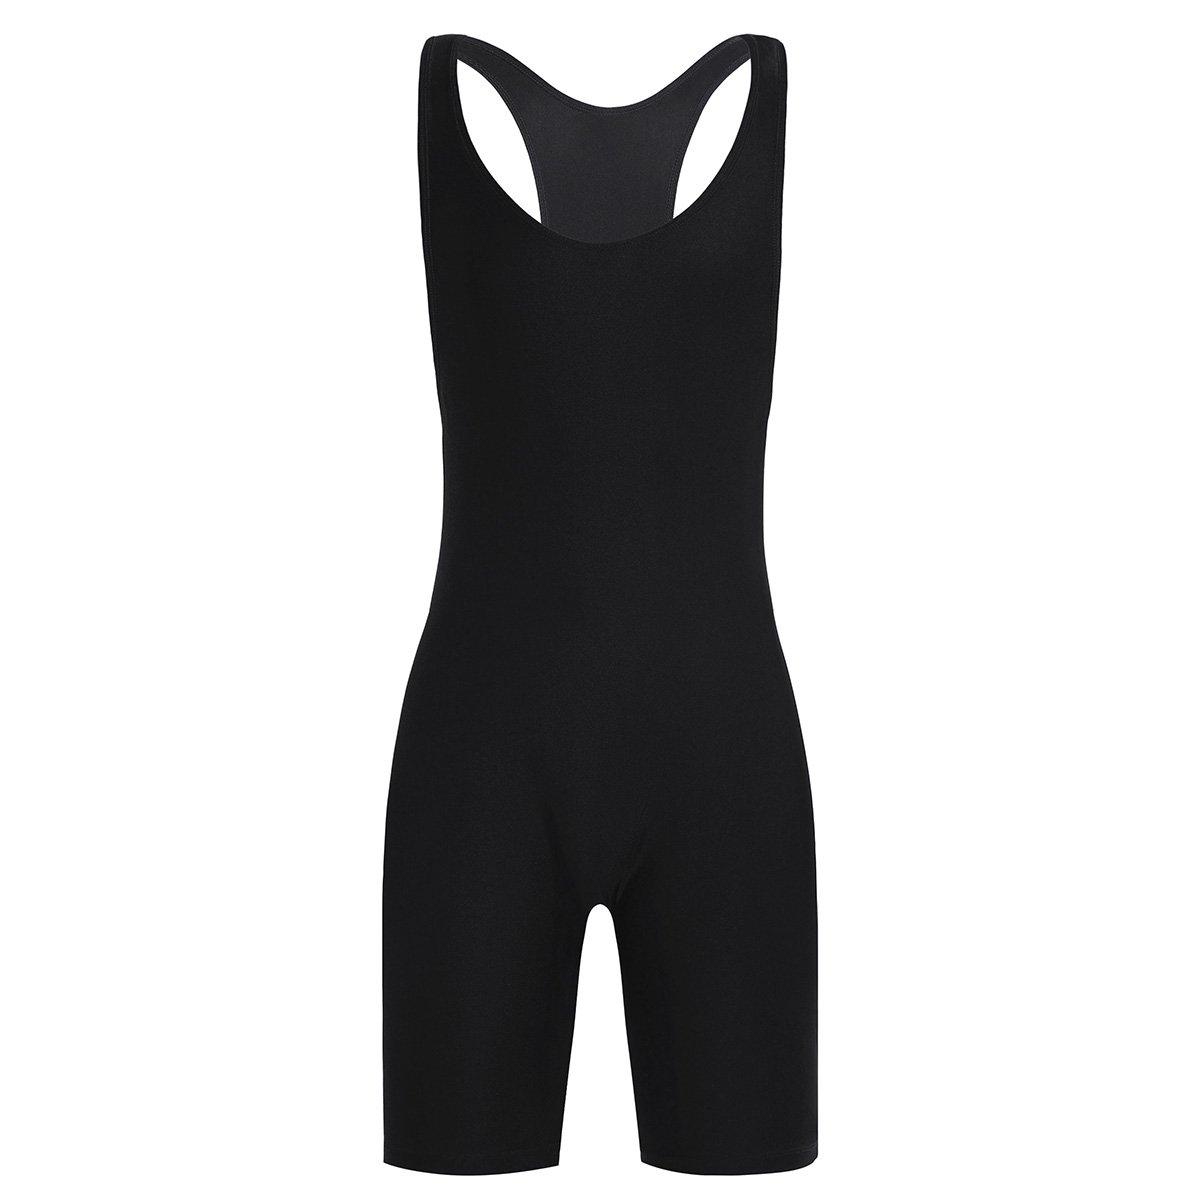 FEESHOW Men's Wrestling Singlet One Piece Sport Bodysuit Leotard Gym Outfit Underwear Black X-Large by FEESHOW